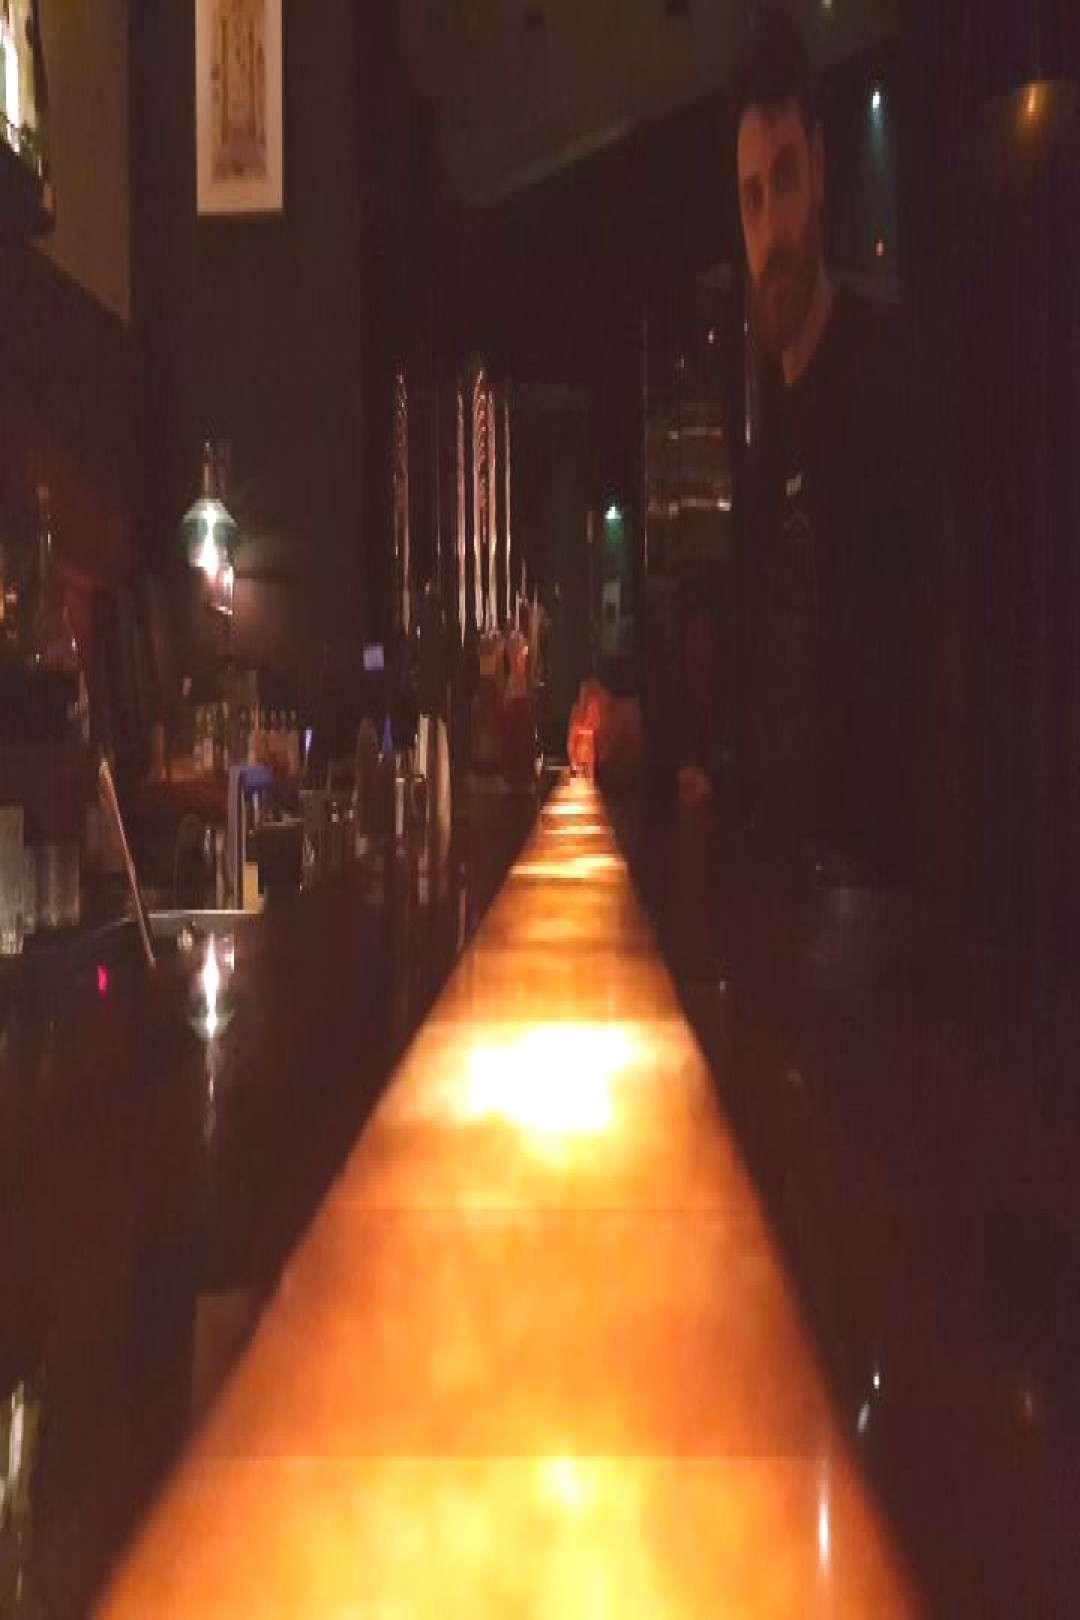 #mixeddrink #bartender #instagoo #bestbar #barlife #barman #ice #bar ICE ICE . . . #bar #bestbar #bartender #barman #barlife #instagooYou can find Mixed drink and more on our website.ICE ICE . . . #bar #bestbar #bartender #barman #barlife #instagoo